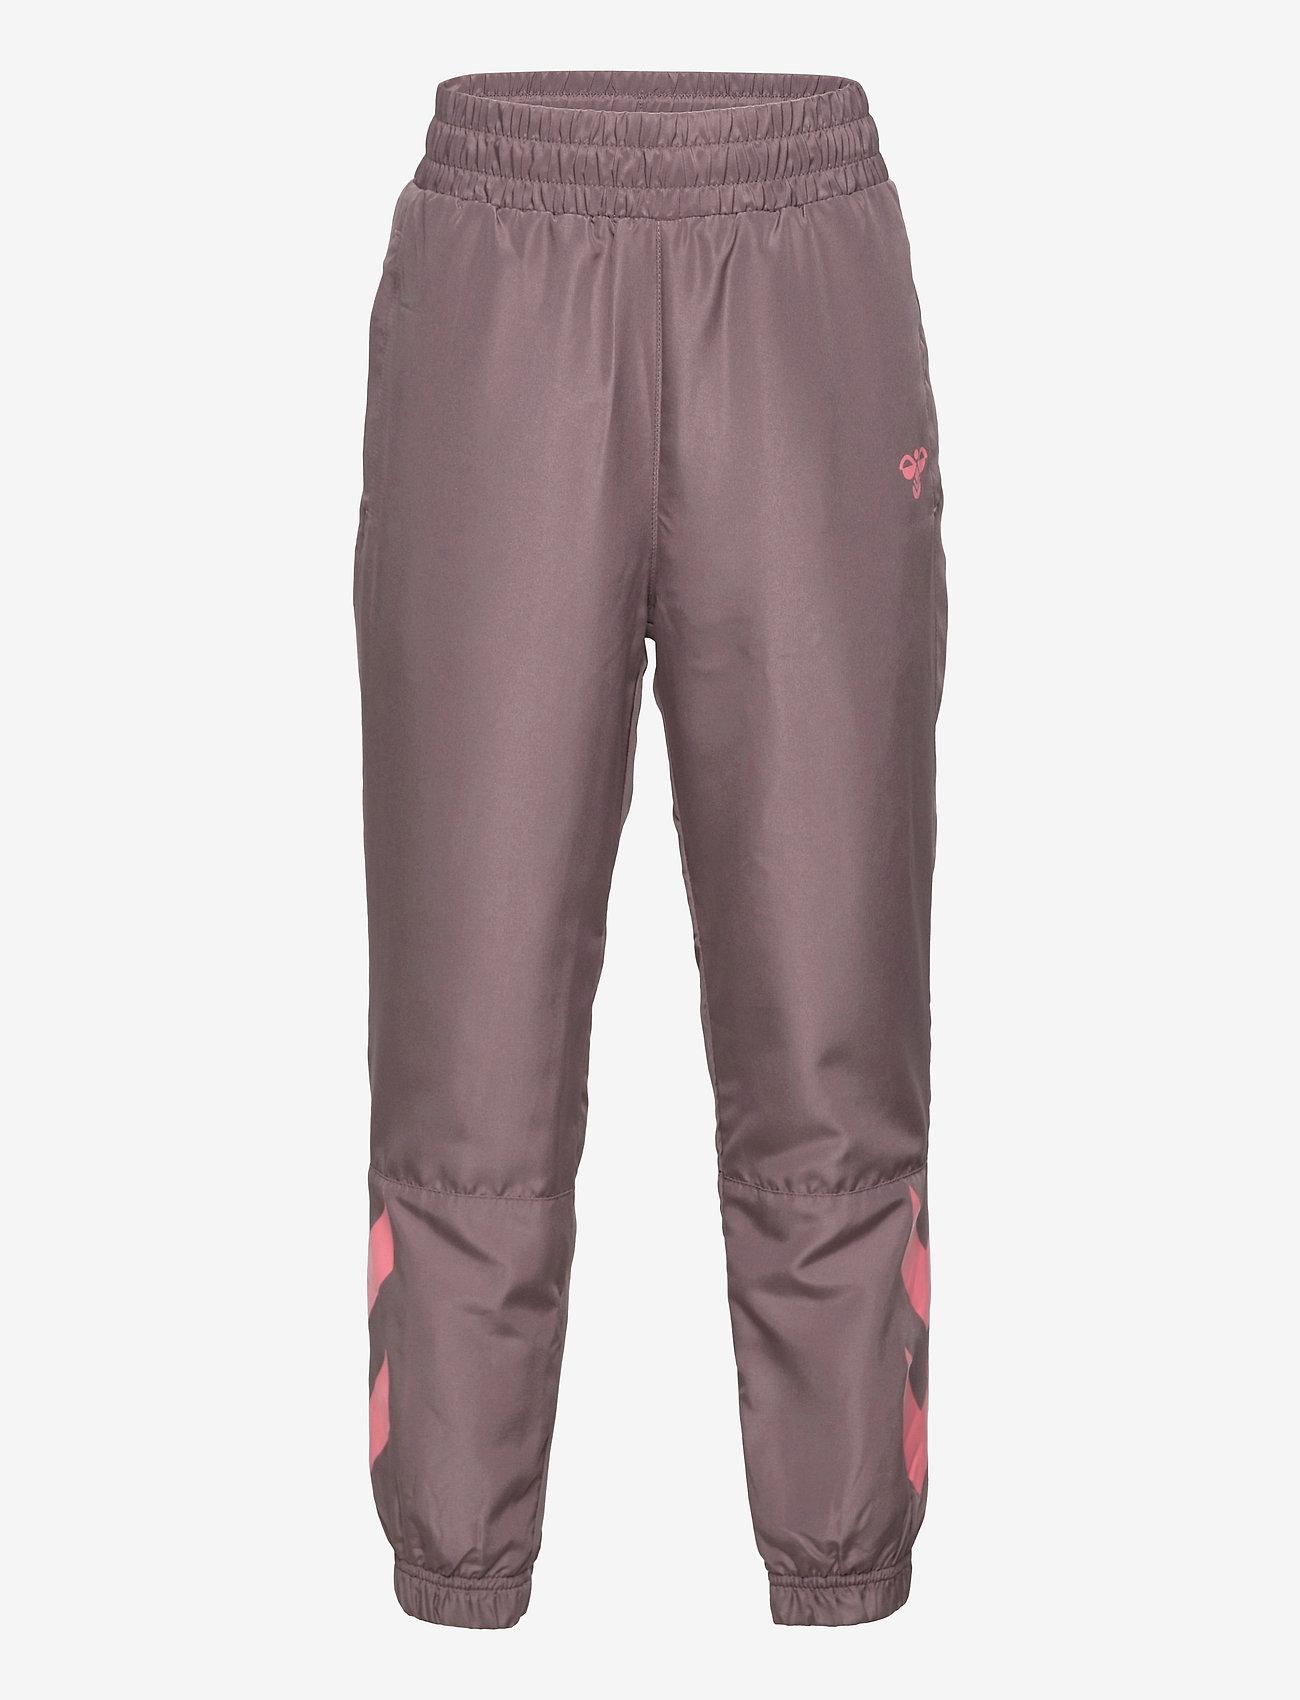 Hummel - hmlSPOT PANTS - sweatpants - sparrow - 0